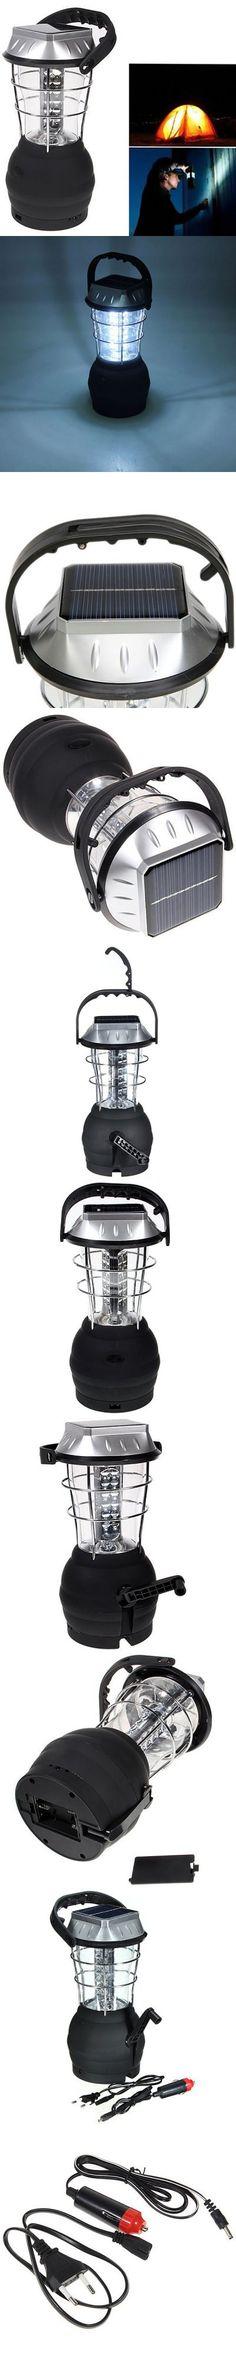 Outdoor Lights   CIS - 54038 36 - LED Hand Crank Solar Lantern Camping Lamp